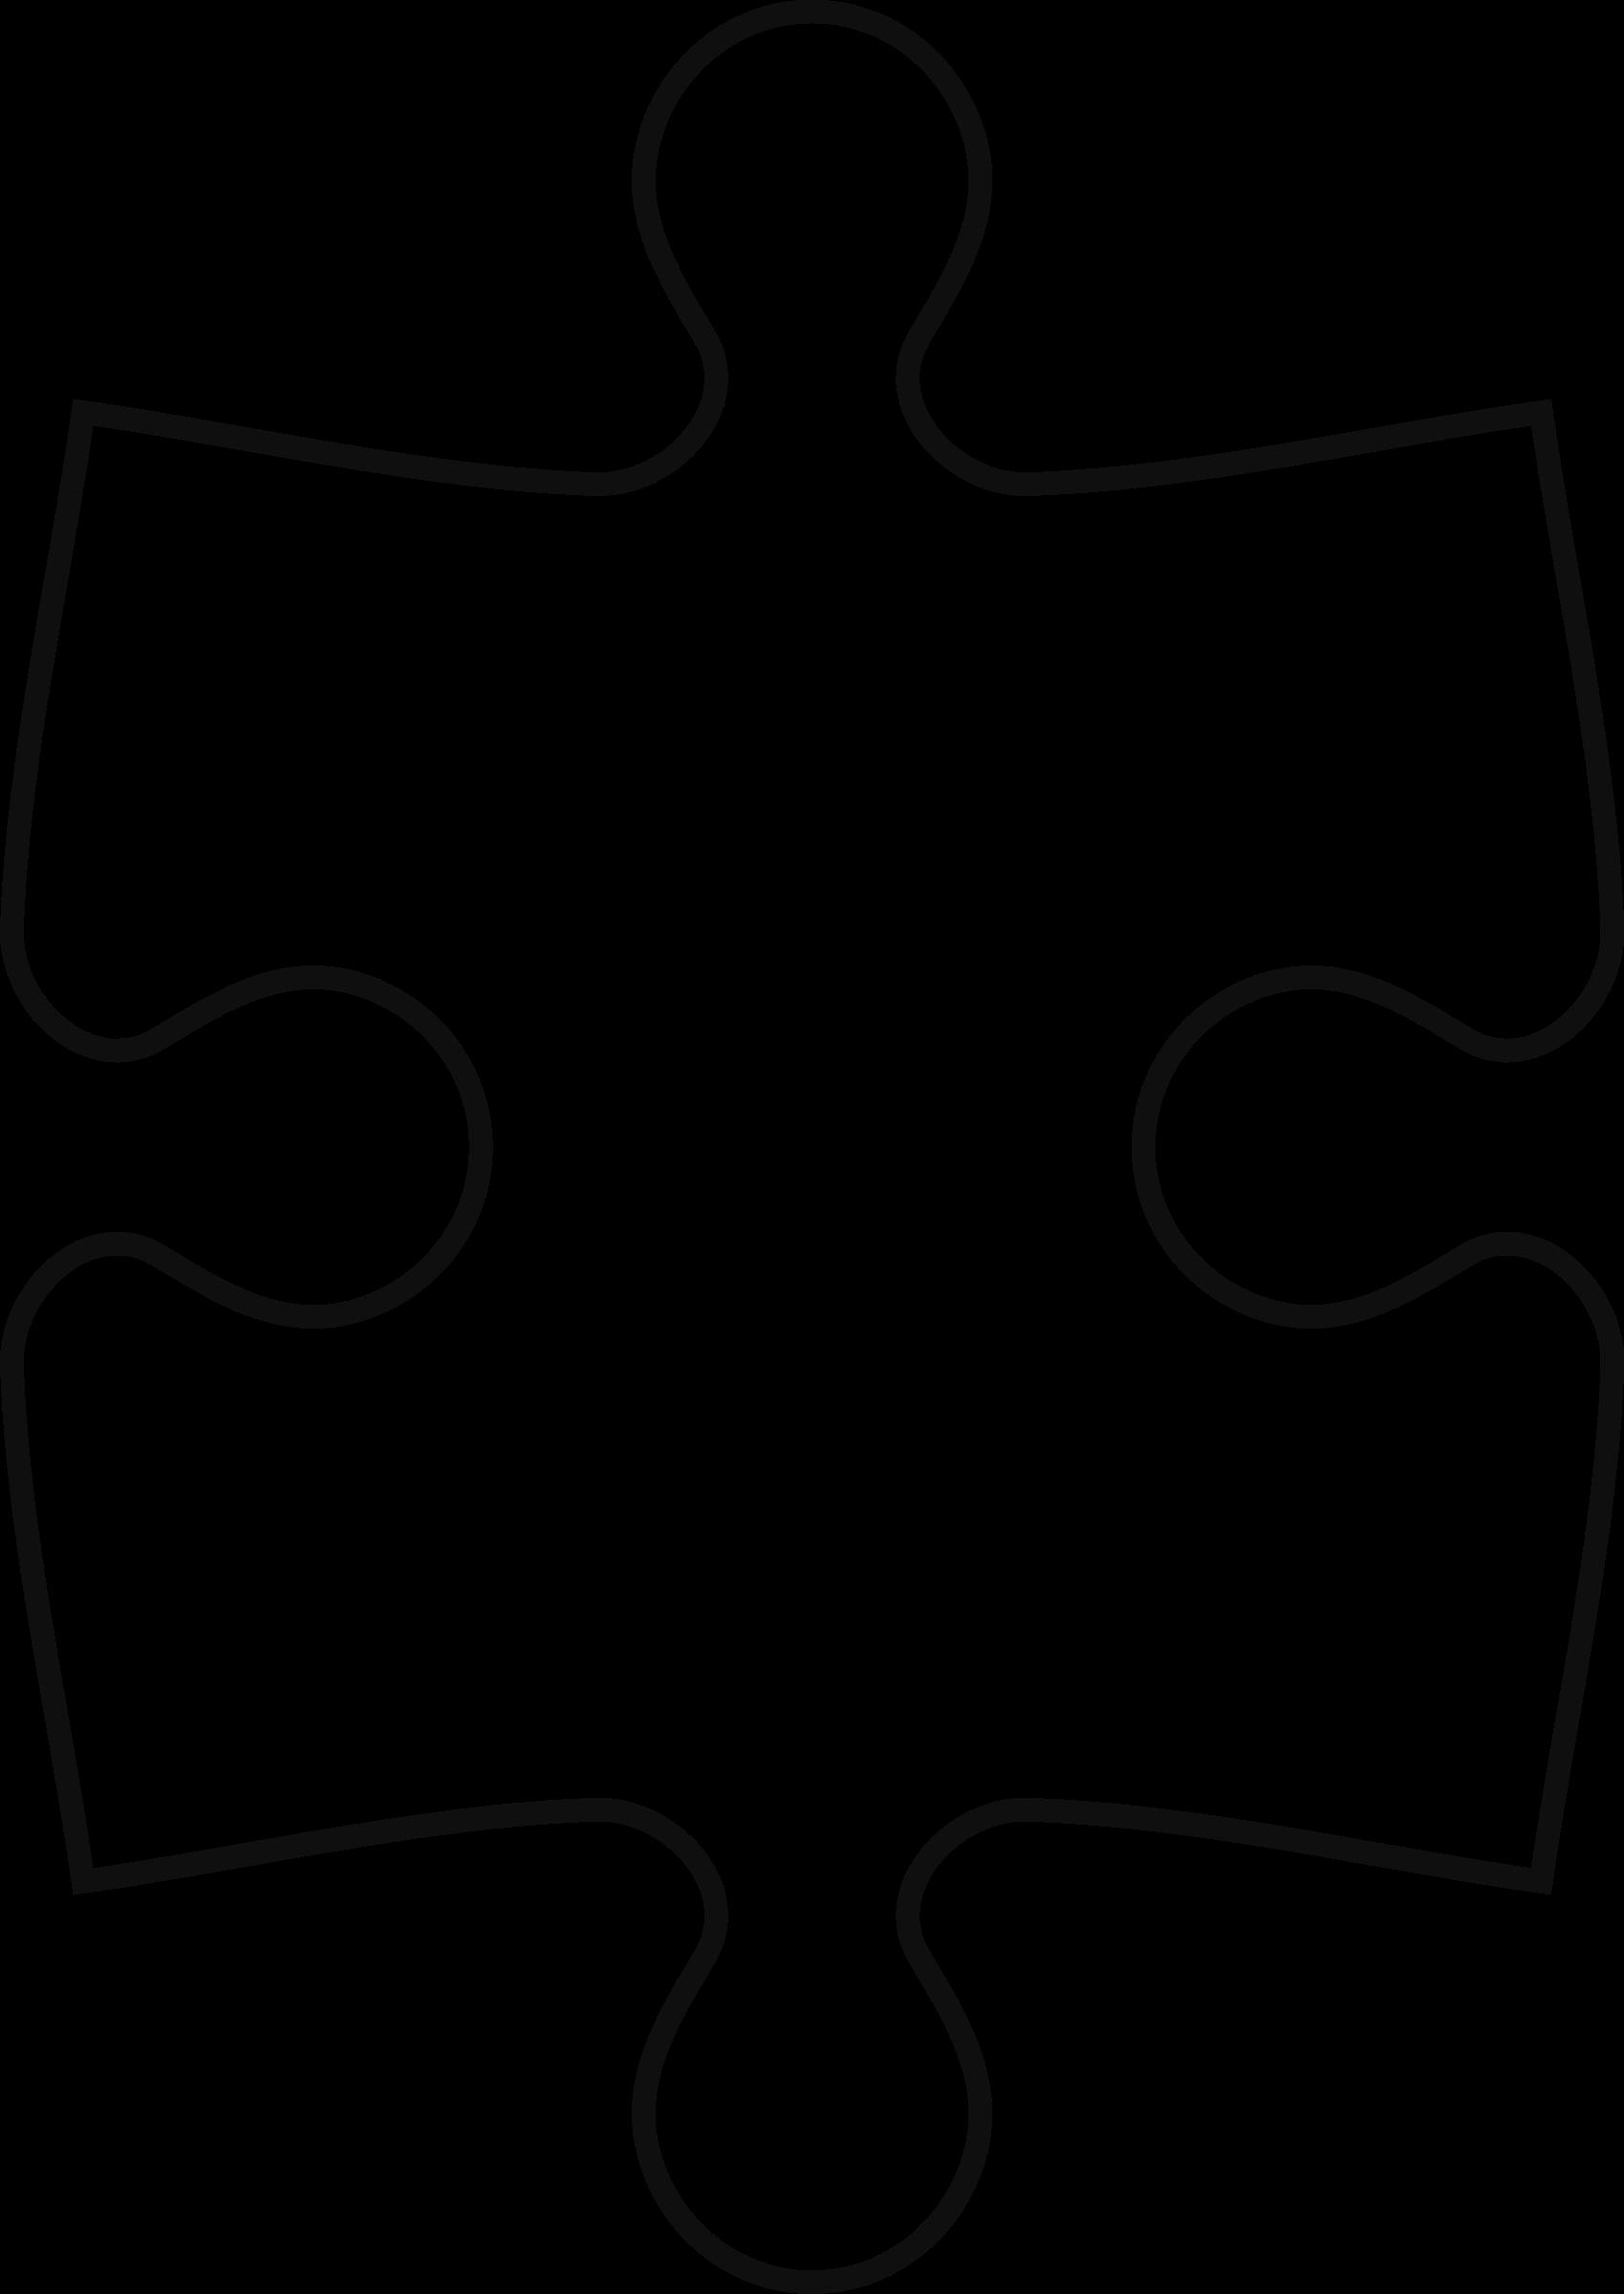 Puzzle clipart 4 piece. Of symetric big image